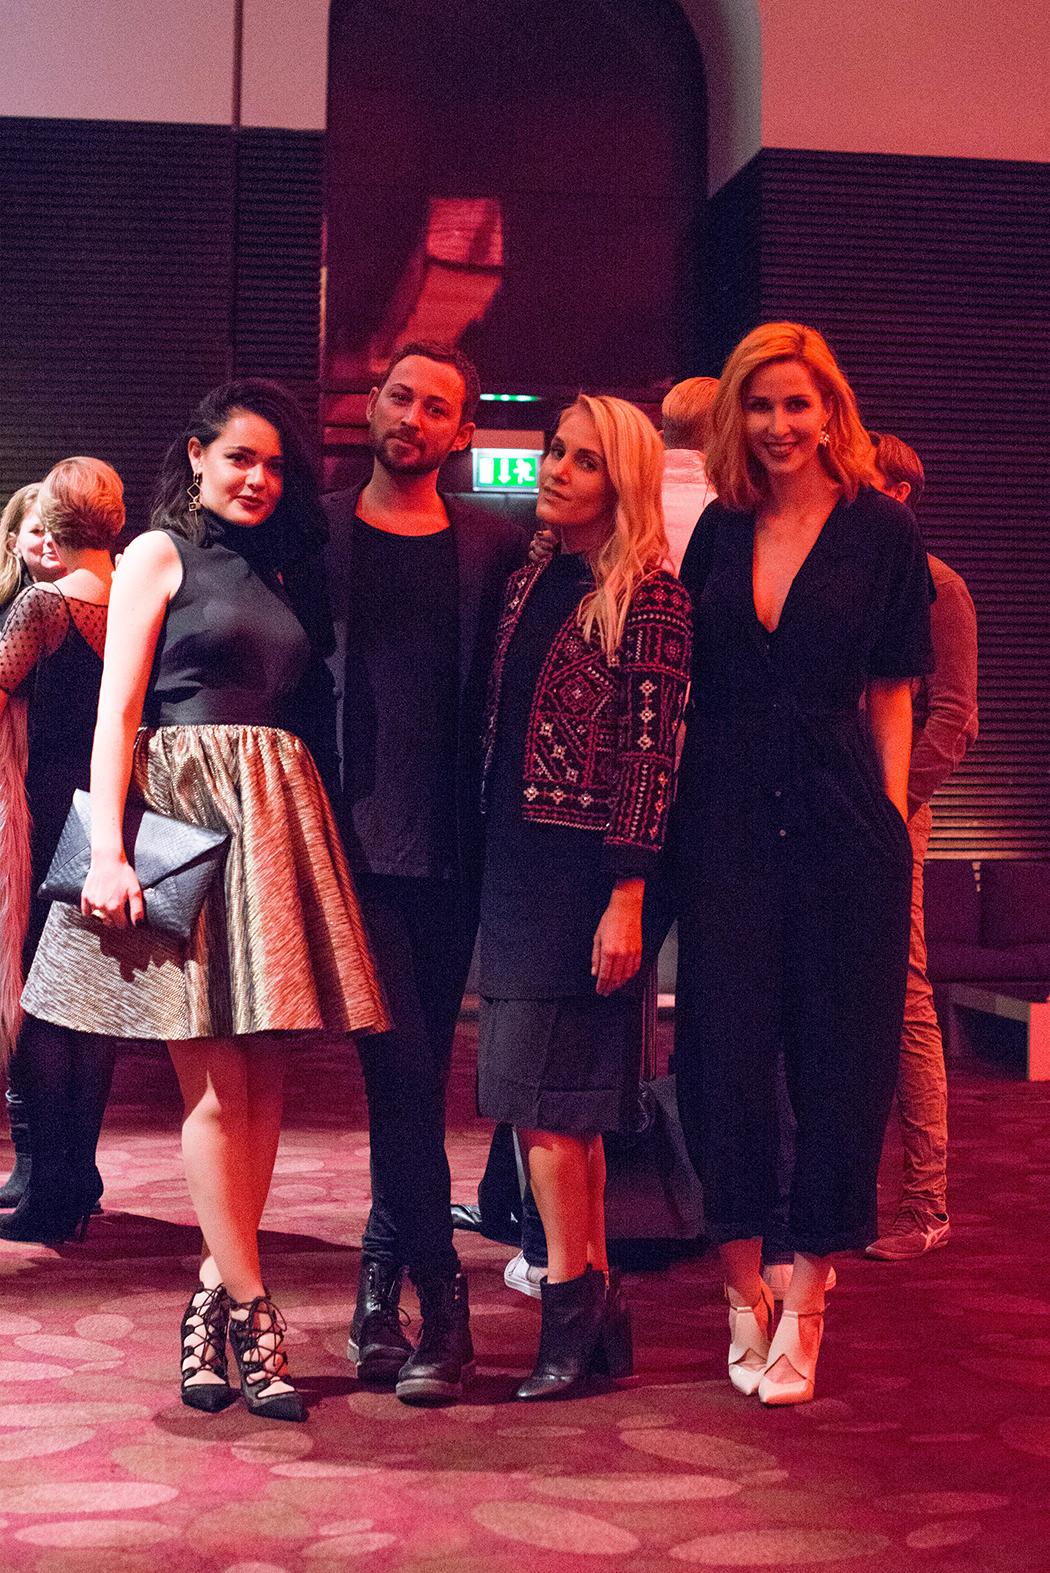 Fashionblog-Fashionblogger-Fashion-Blog-Blogger-Lifestyle-Lindarella-Marcel-Ostertag-Fashionshow-14-web